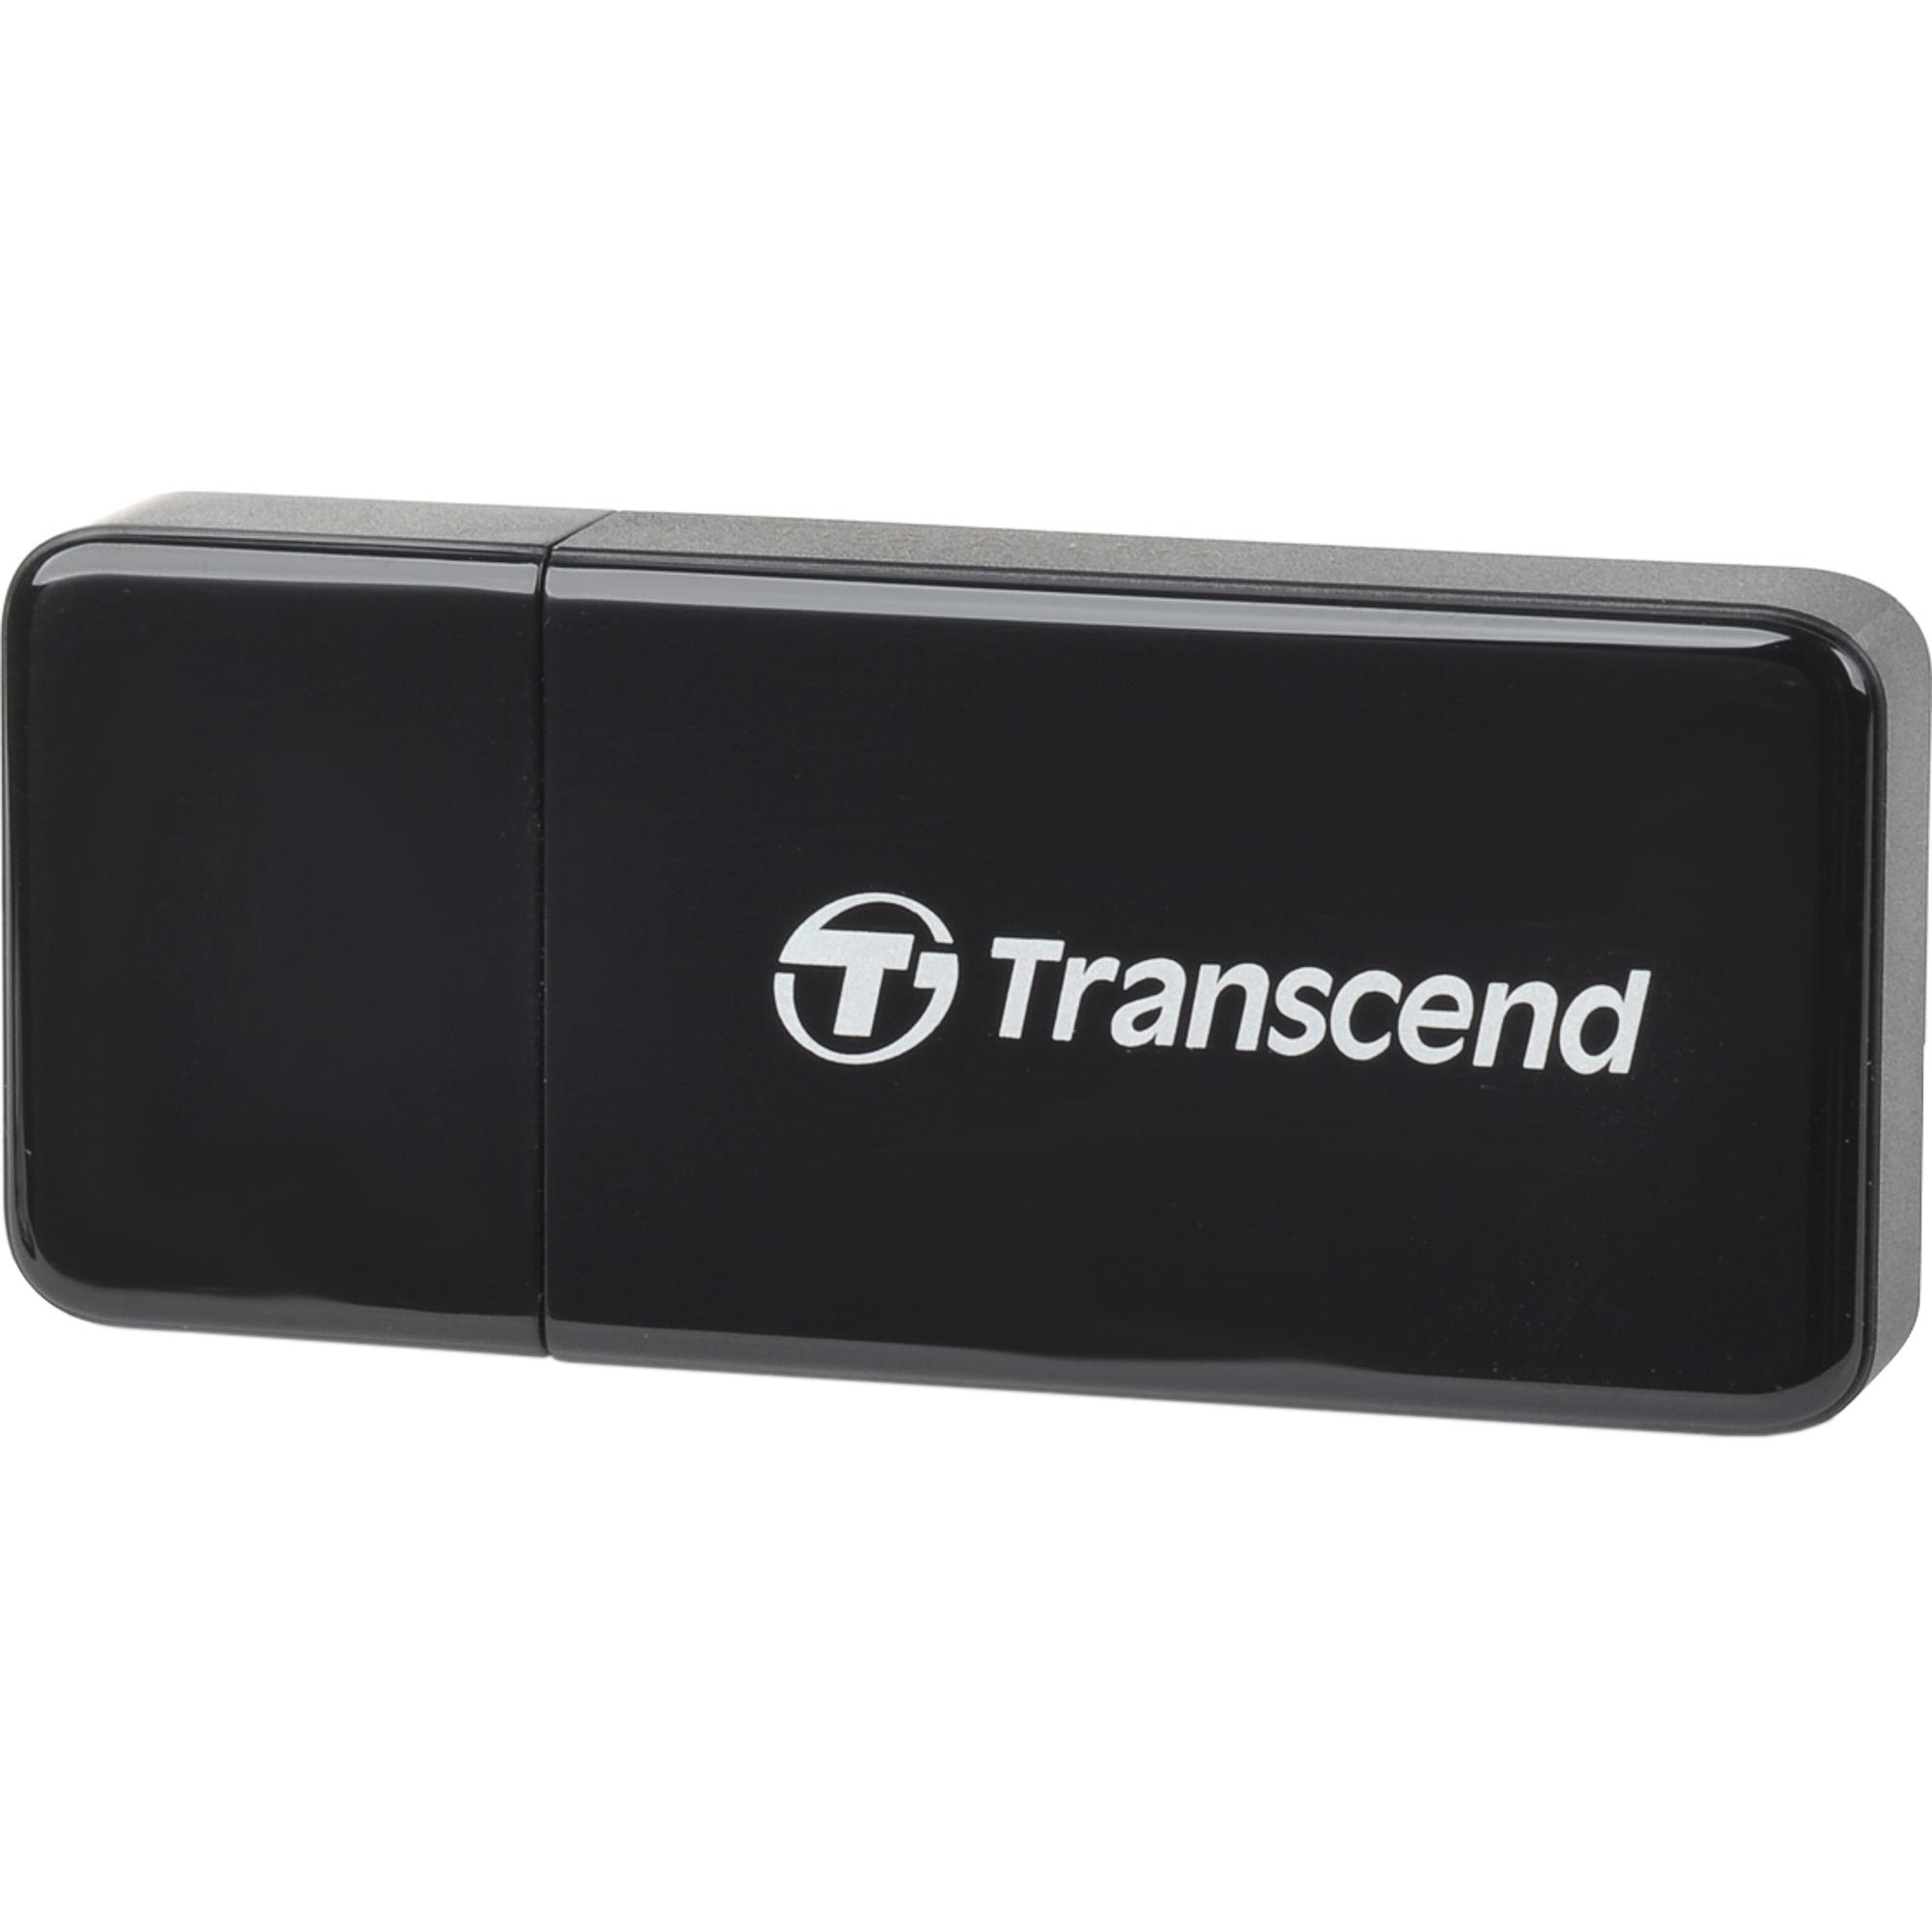 Фото - Картридер Transcend TS-RDF5K Black картридер внешний cbr human friends speed rate multi black microsd